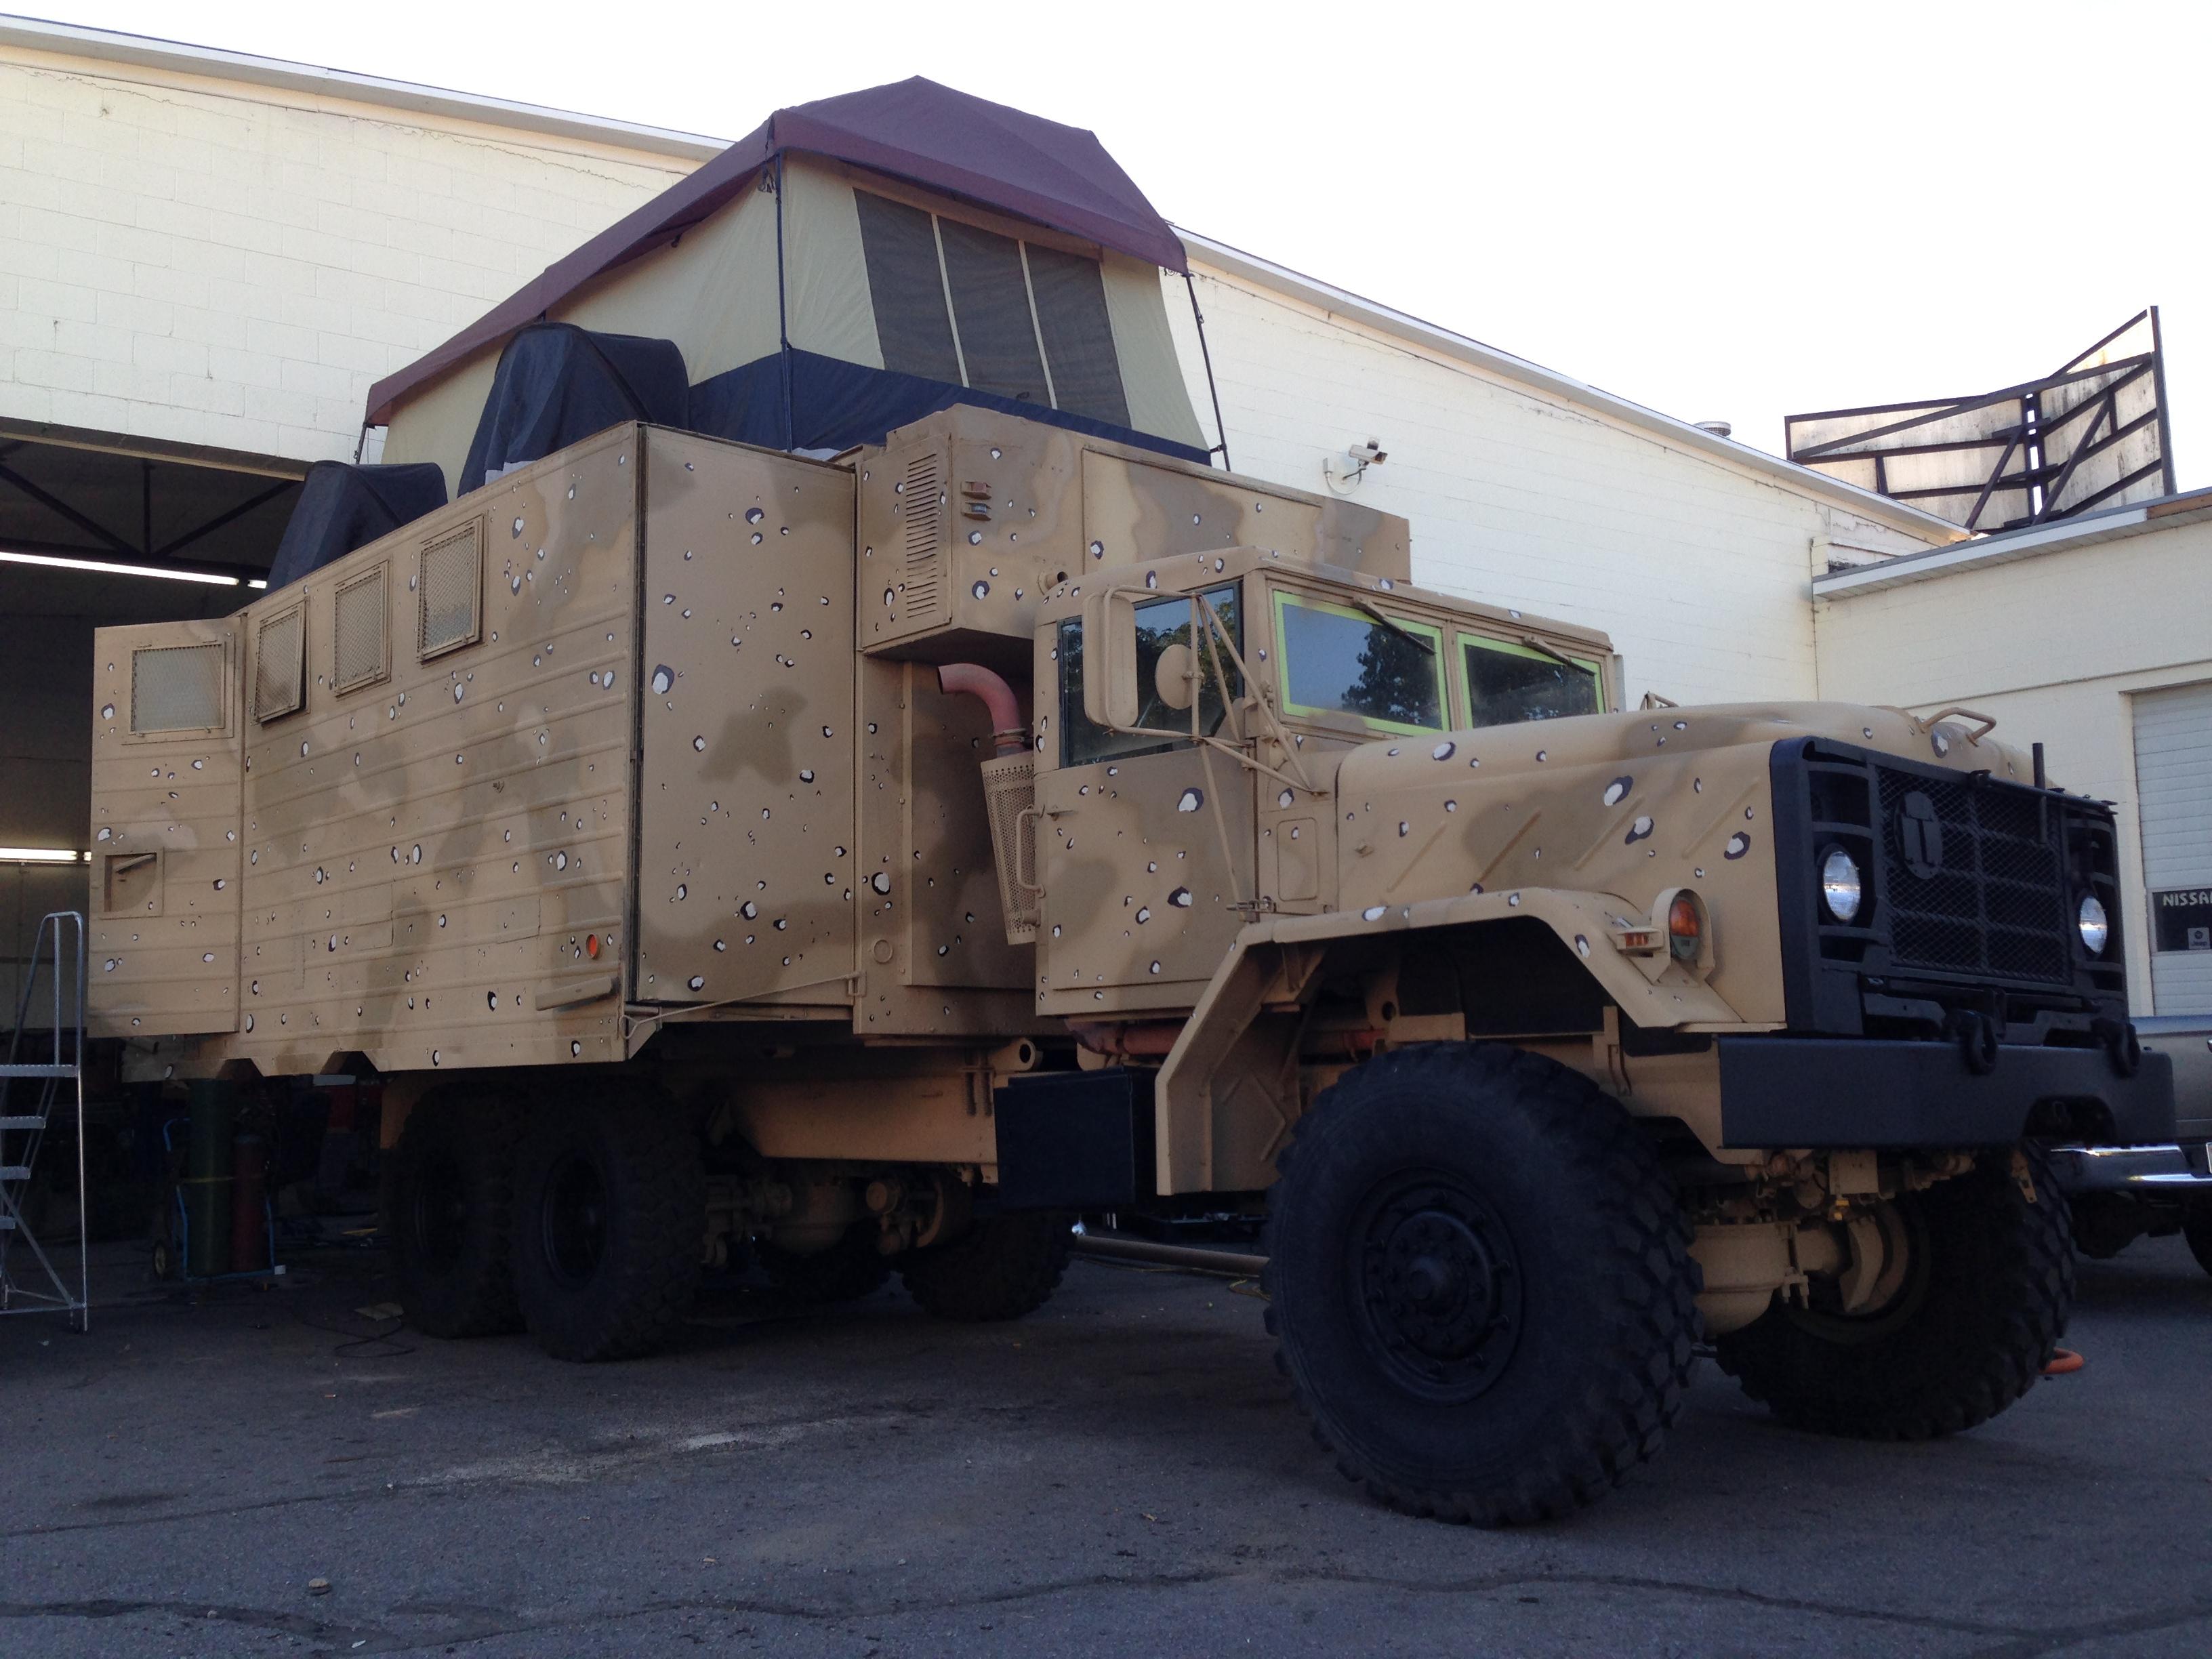 Ford Vin Decoder Europe >> 4x4 Truck Motorhome | Autos Post